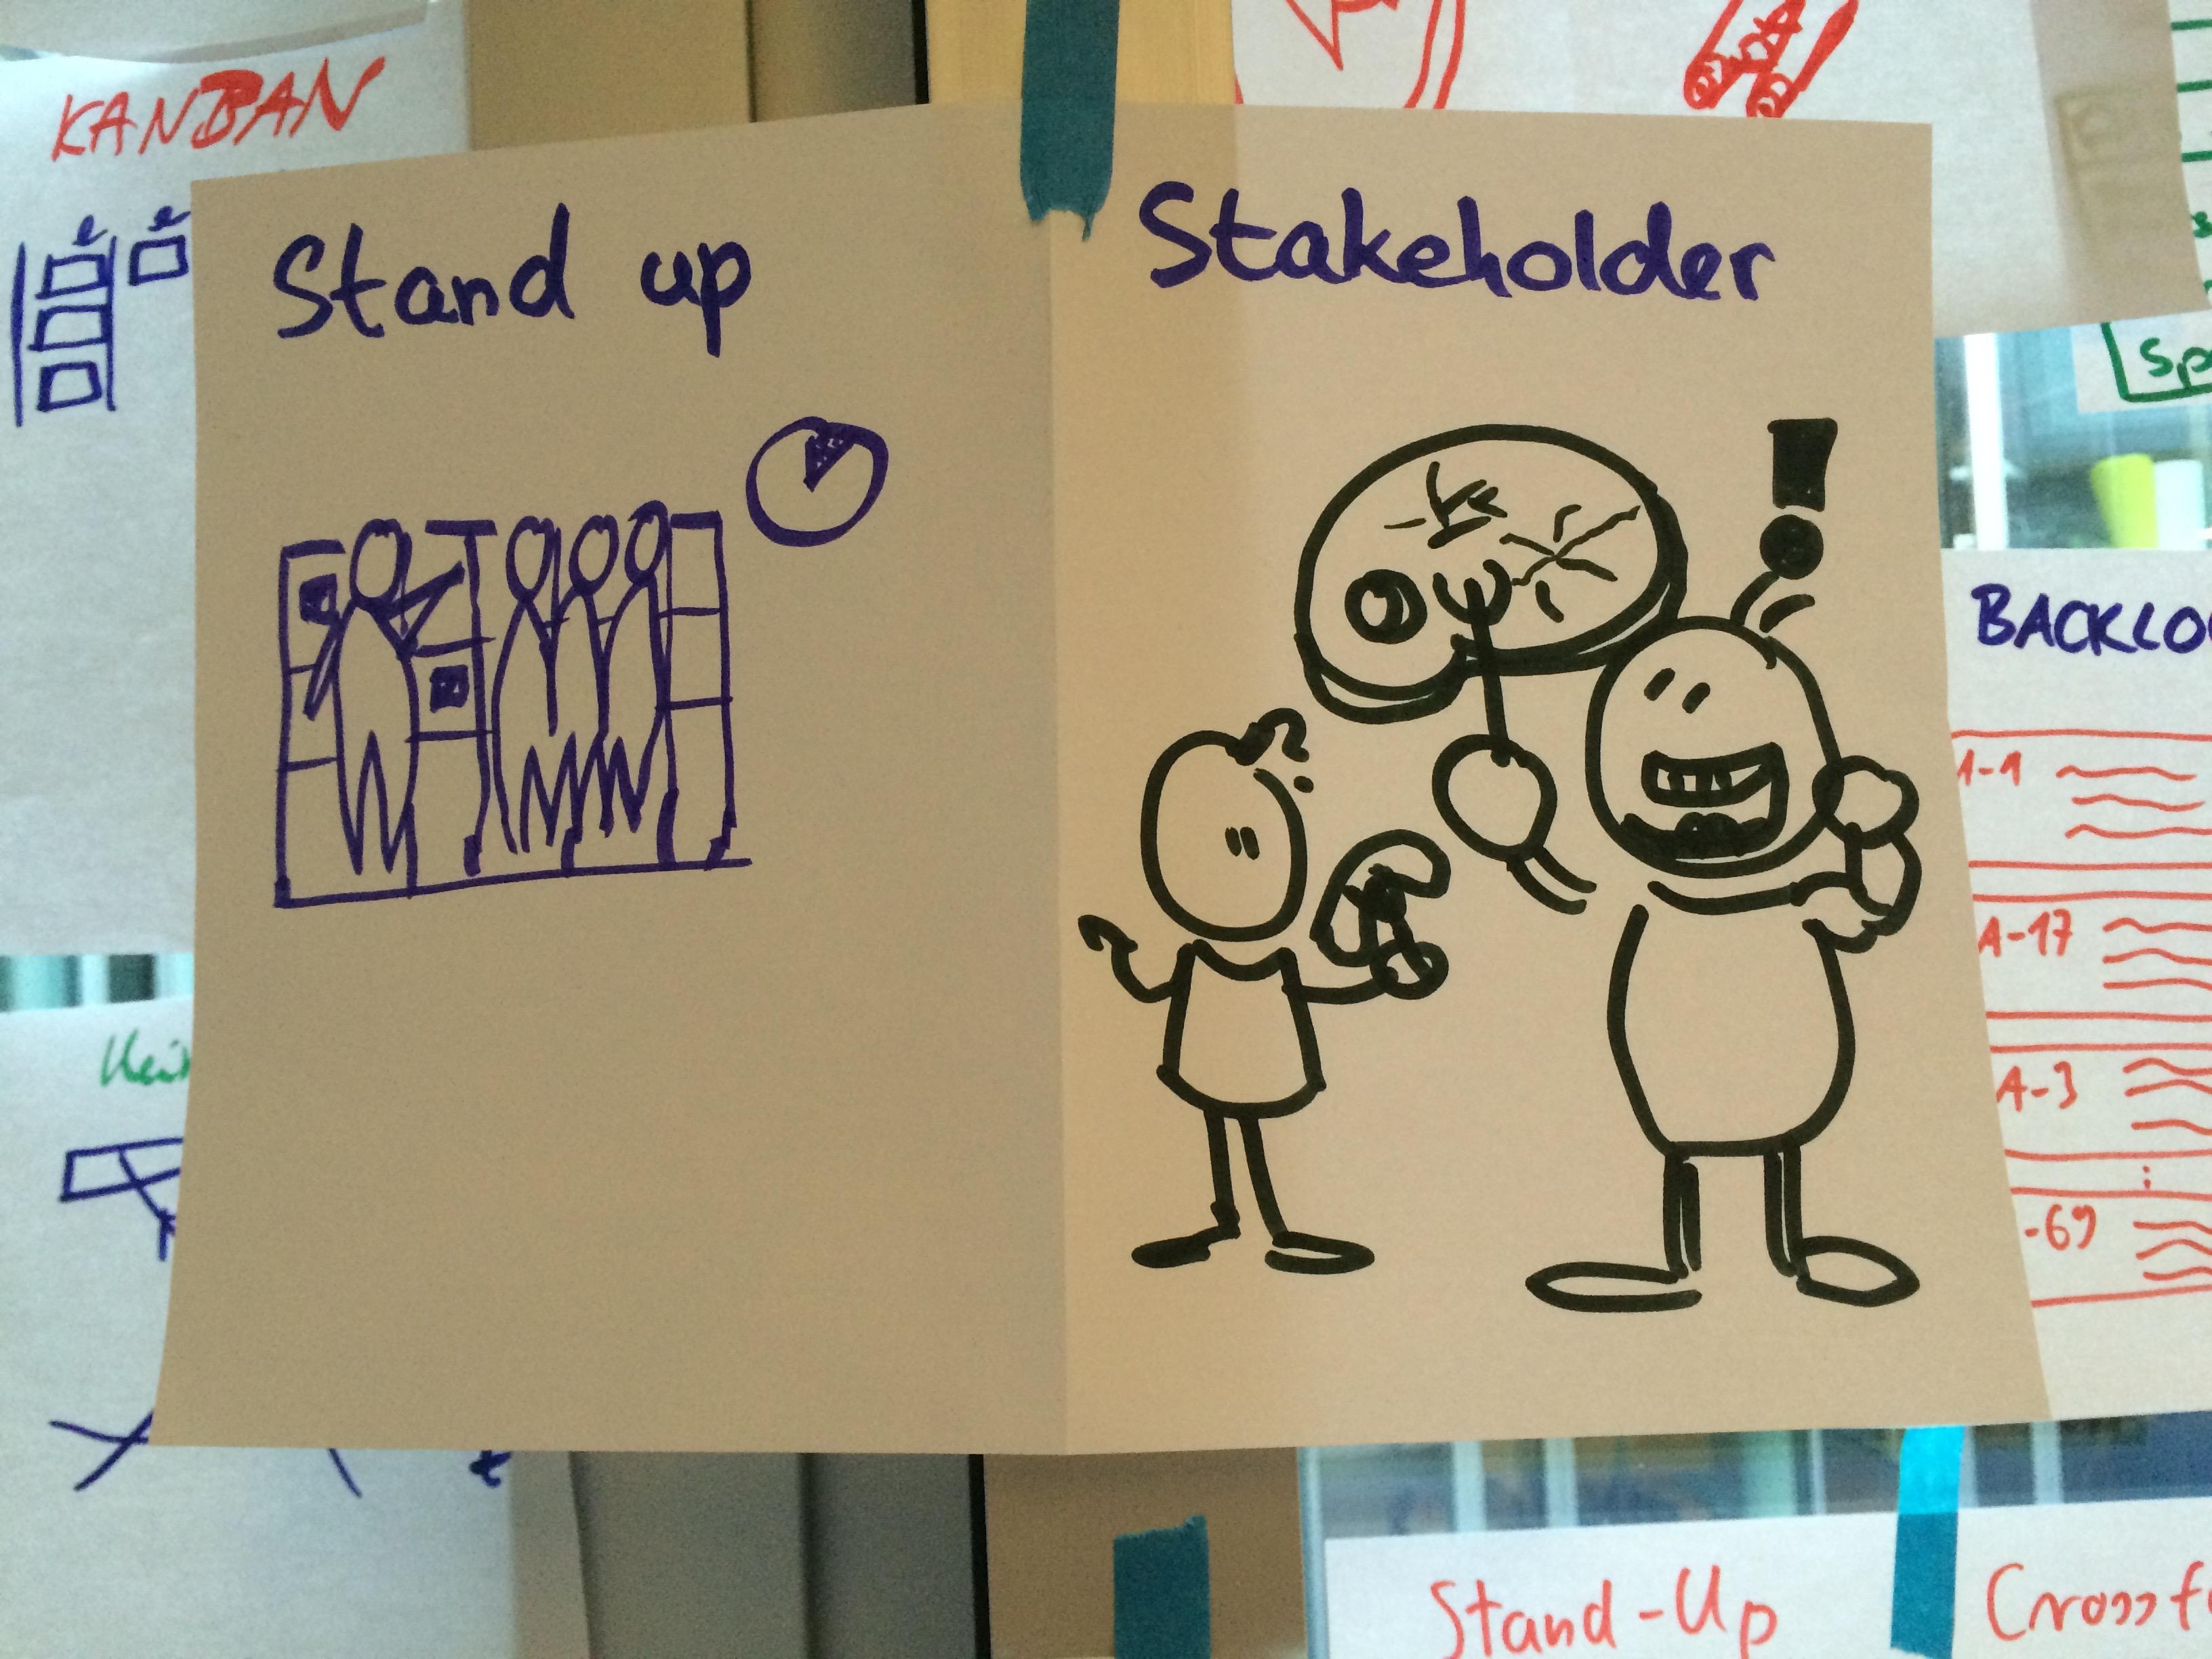 standup_stakeholder